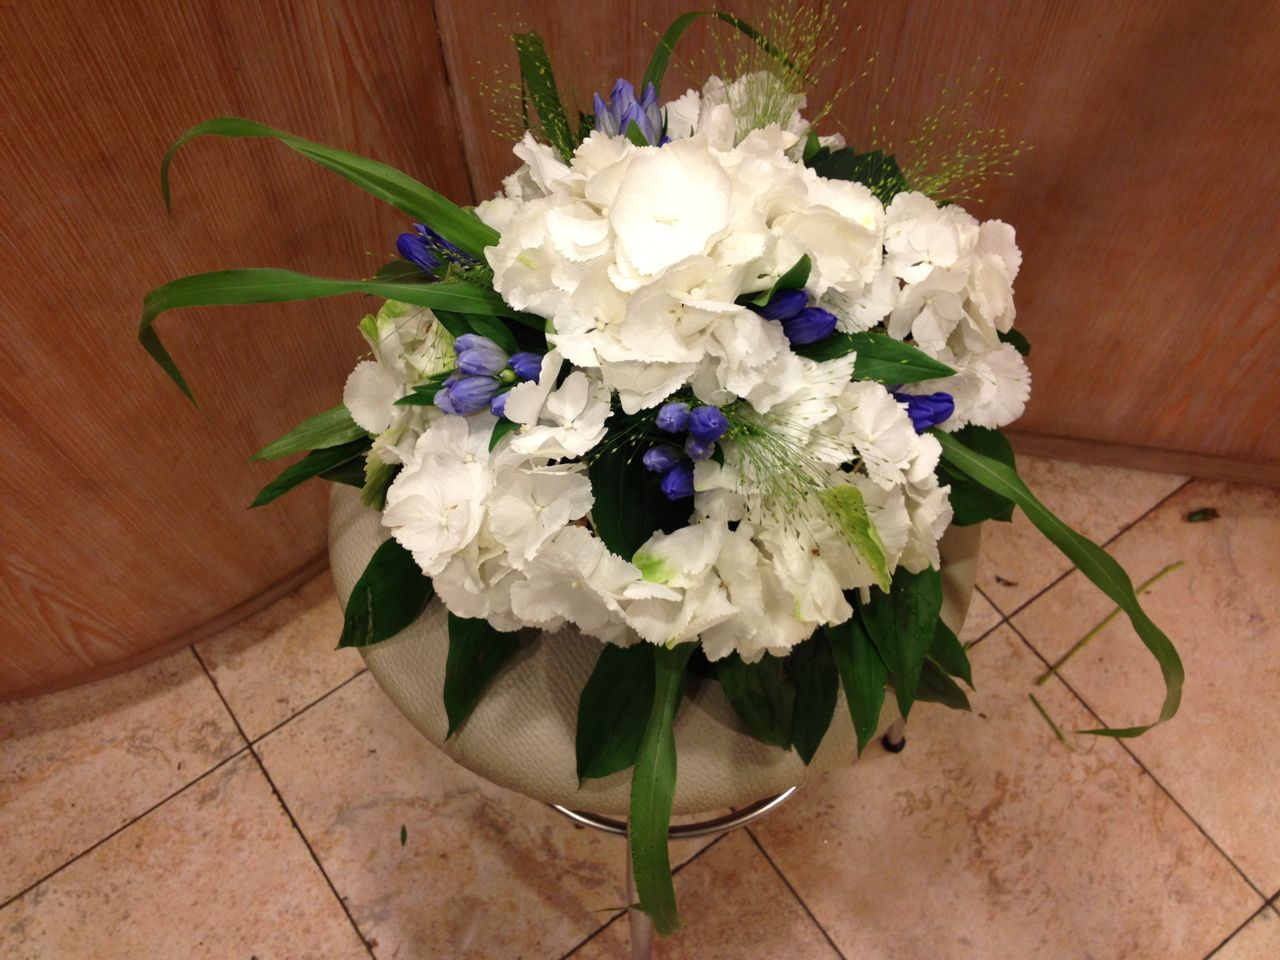 Centrotavola Ortensie Bianche : Elisabetta fiori e piante centrotavola con ortensie